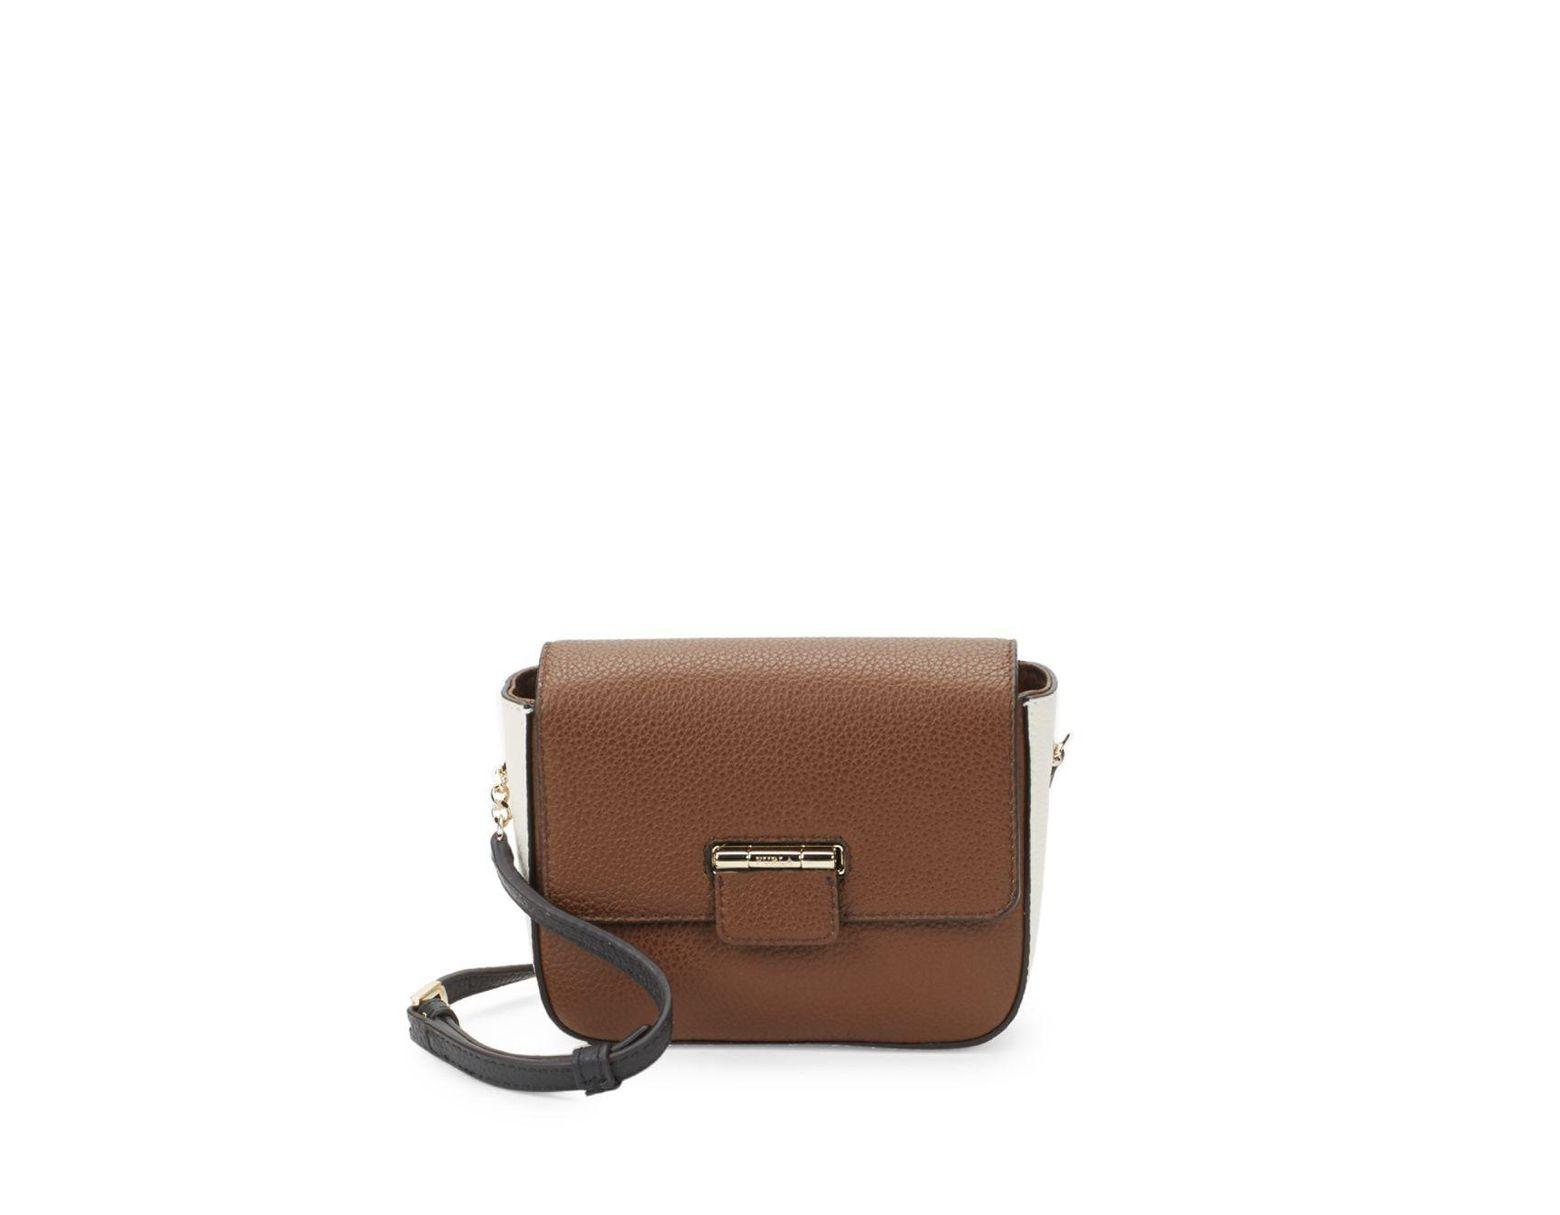 Brown Flap Artesia Leather Women's Mini Crossbody Bag sQrtdhC